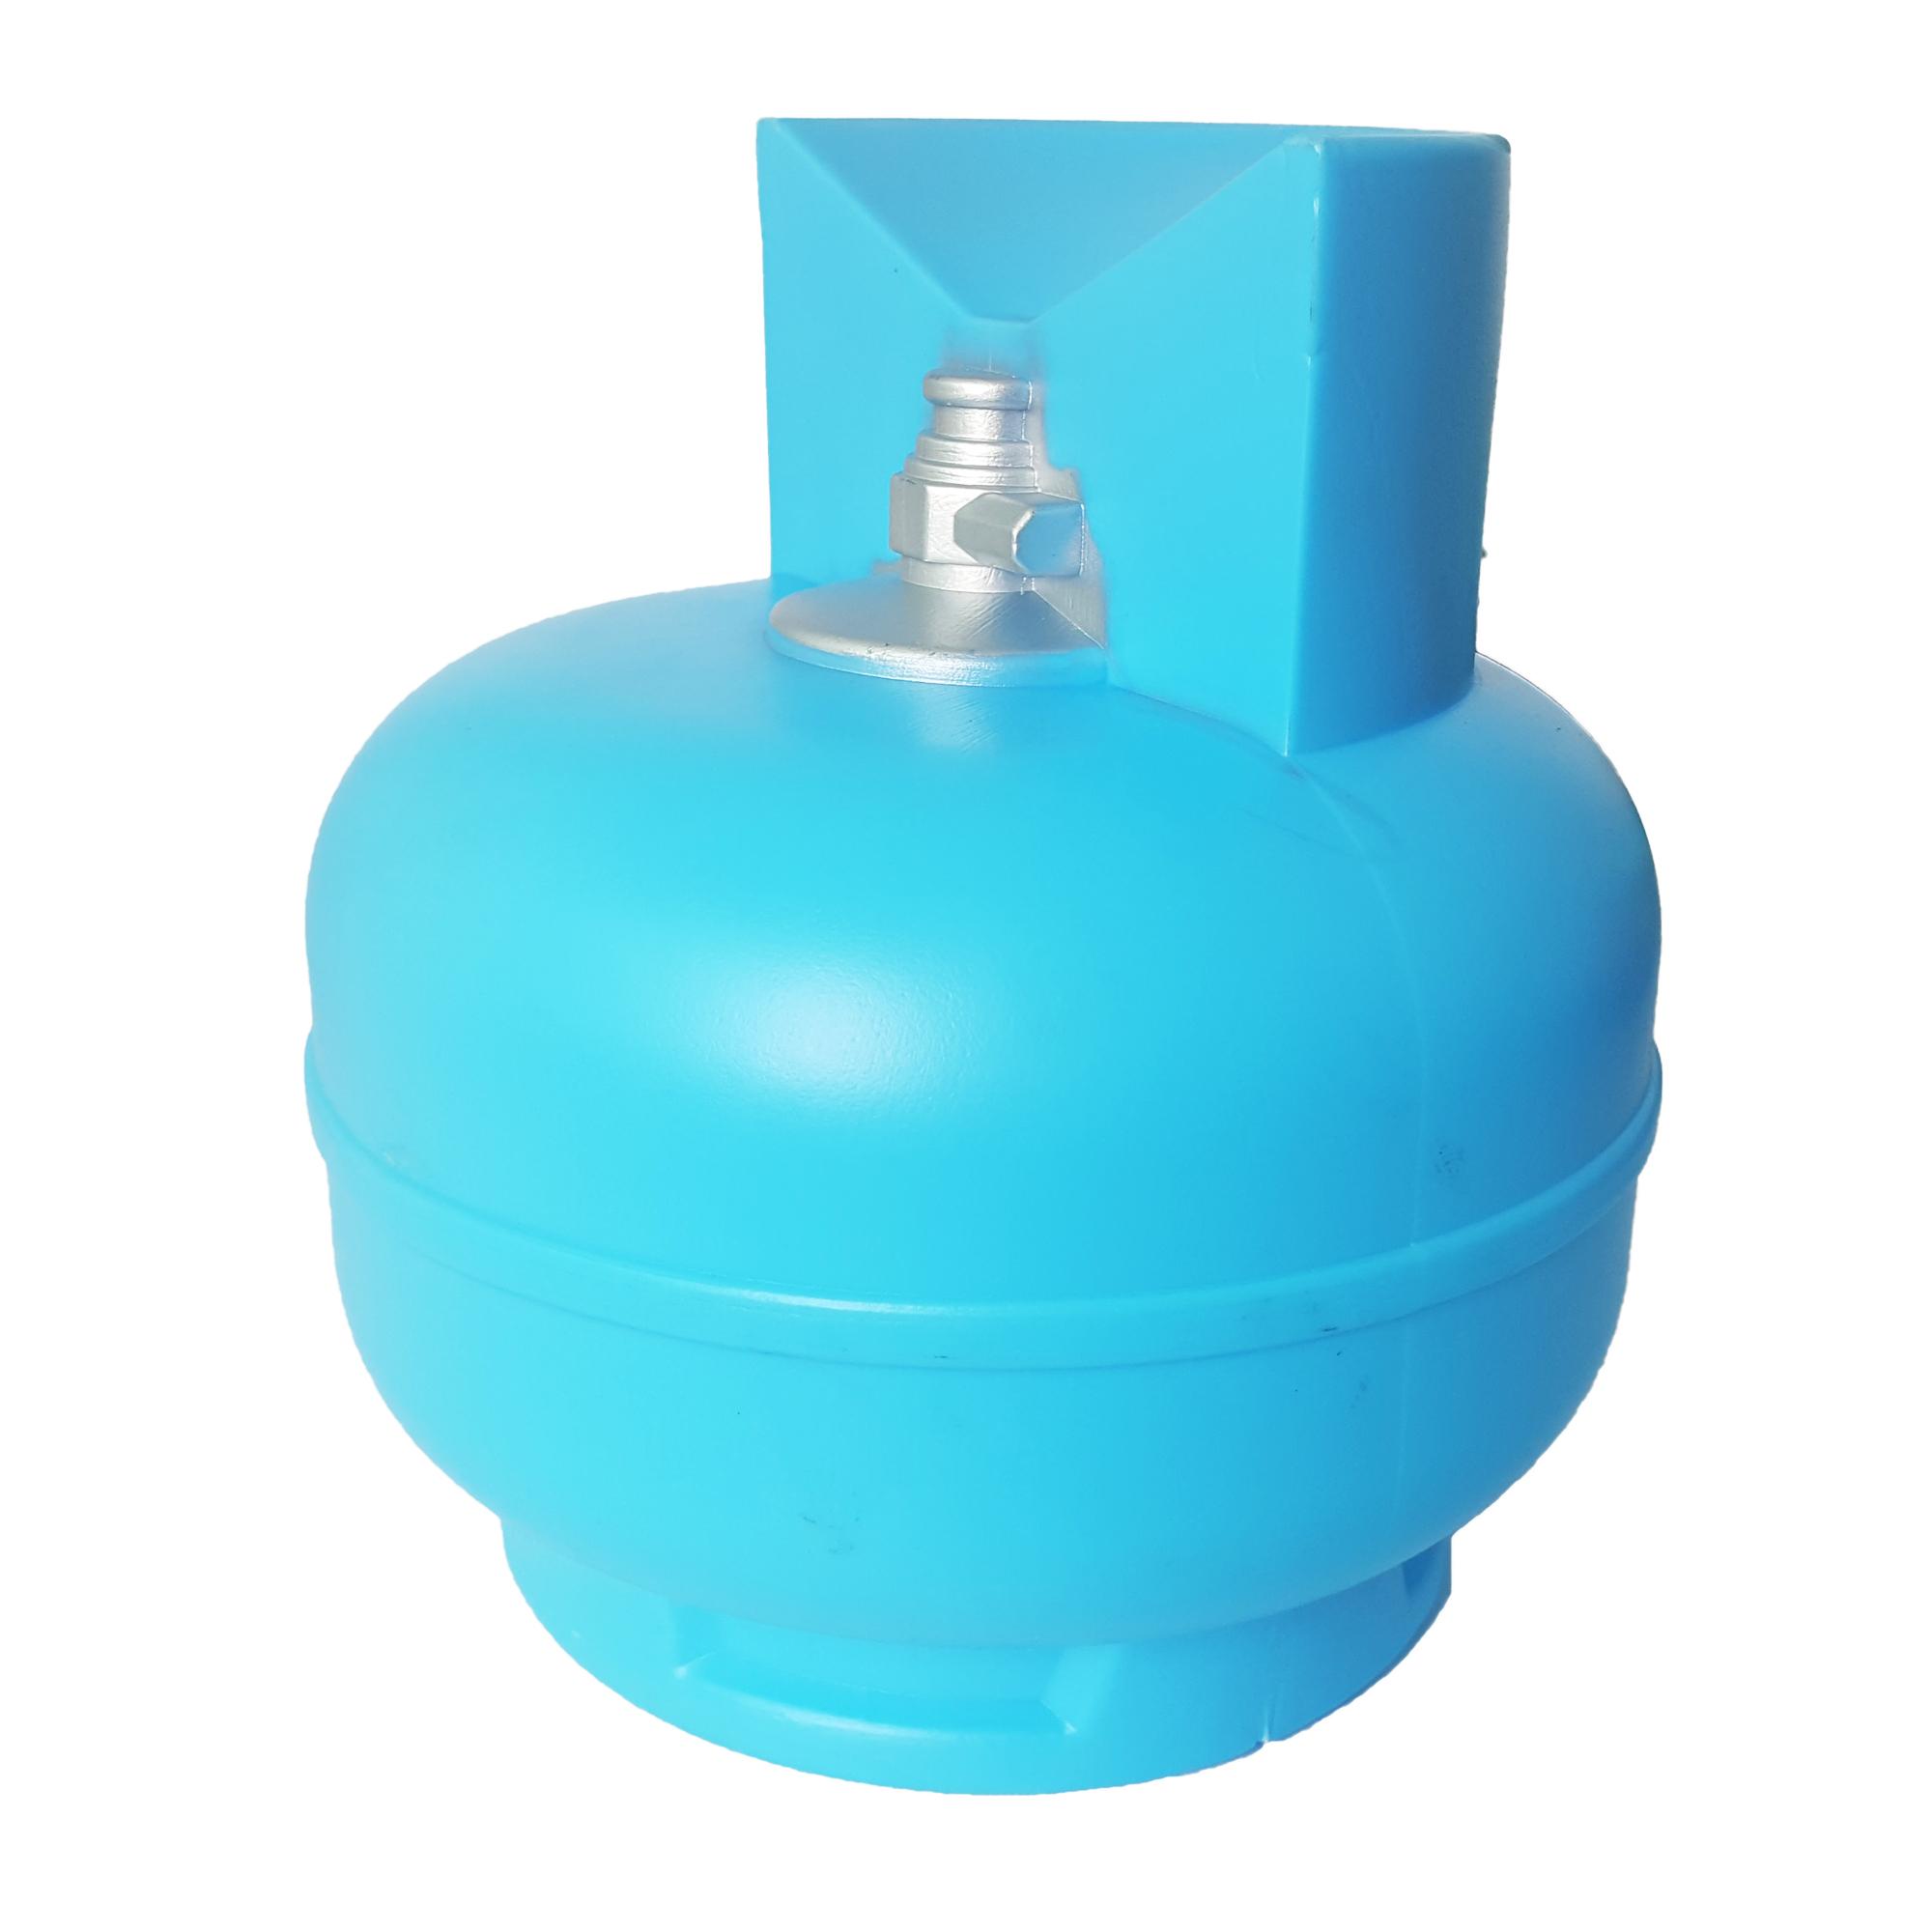 Ocean Toy Dokter Set Mainan Anak Oct2601b Multicolor Daftar Harga Beauty Oct84004ab Celengan Tabung Gas Oti9956